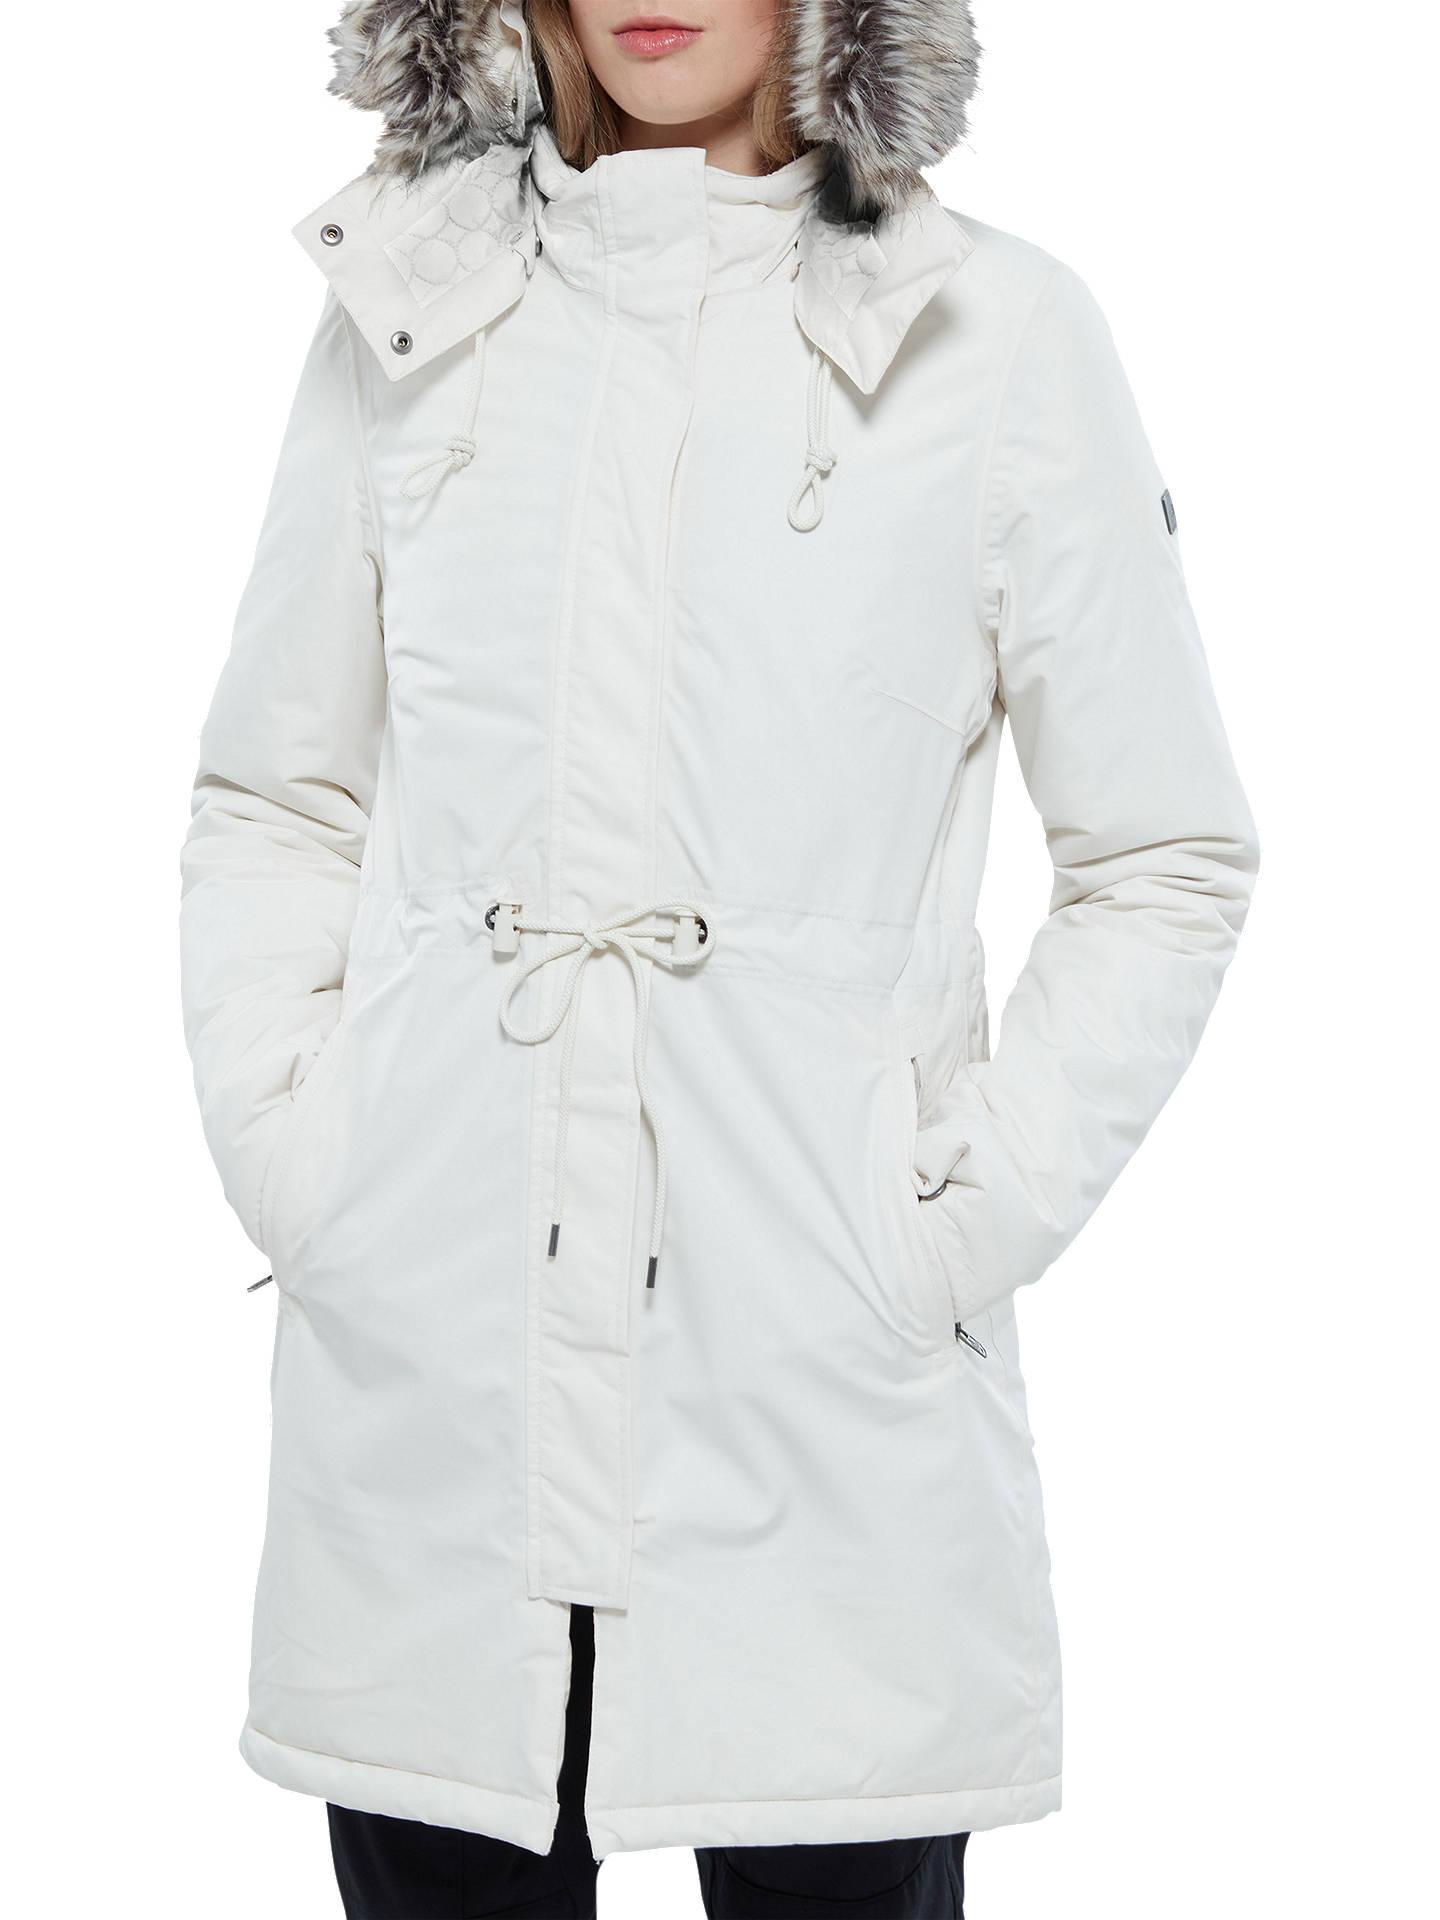 715af68dbbaa ... Buy The North Face Zaneck Hooded Women s Parka Jacket